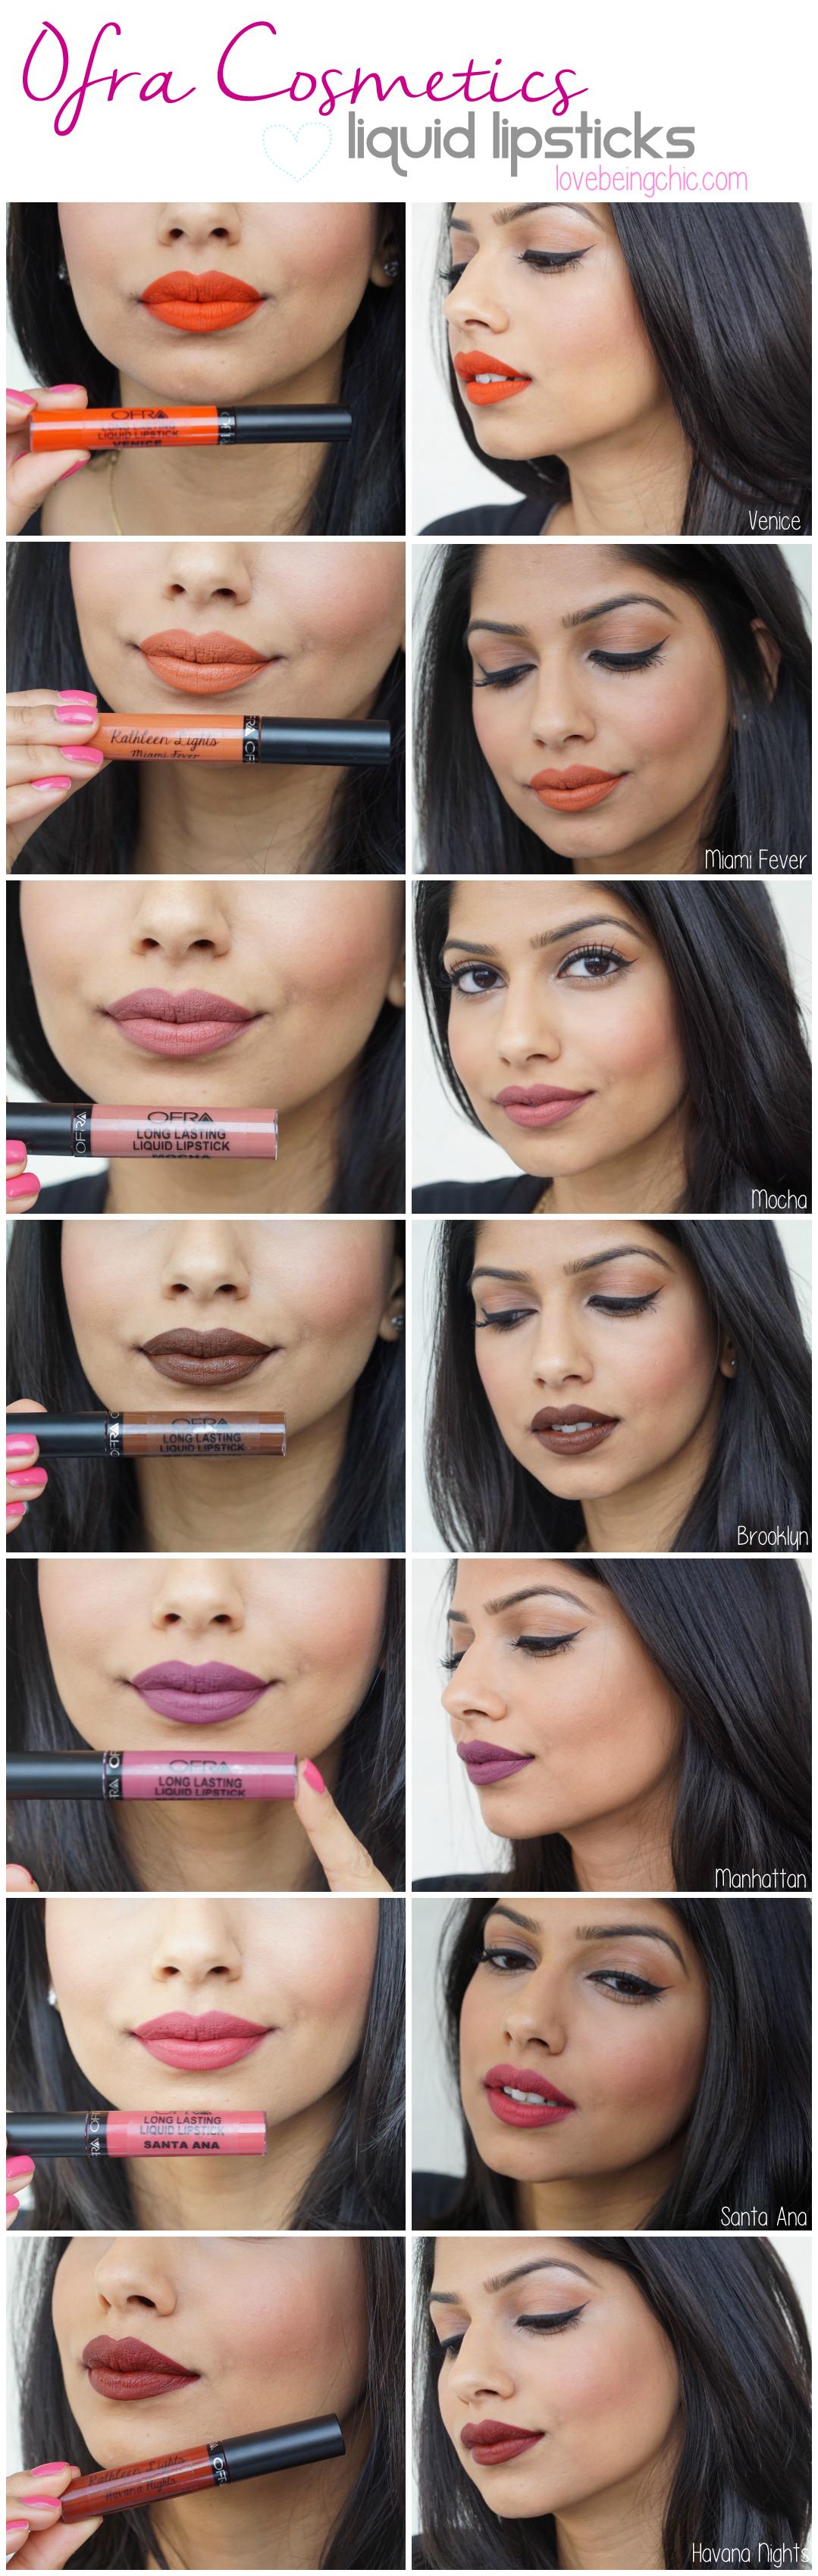 Ofra liquid lipsticks Ofra liquid lipstick, Liquid